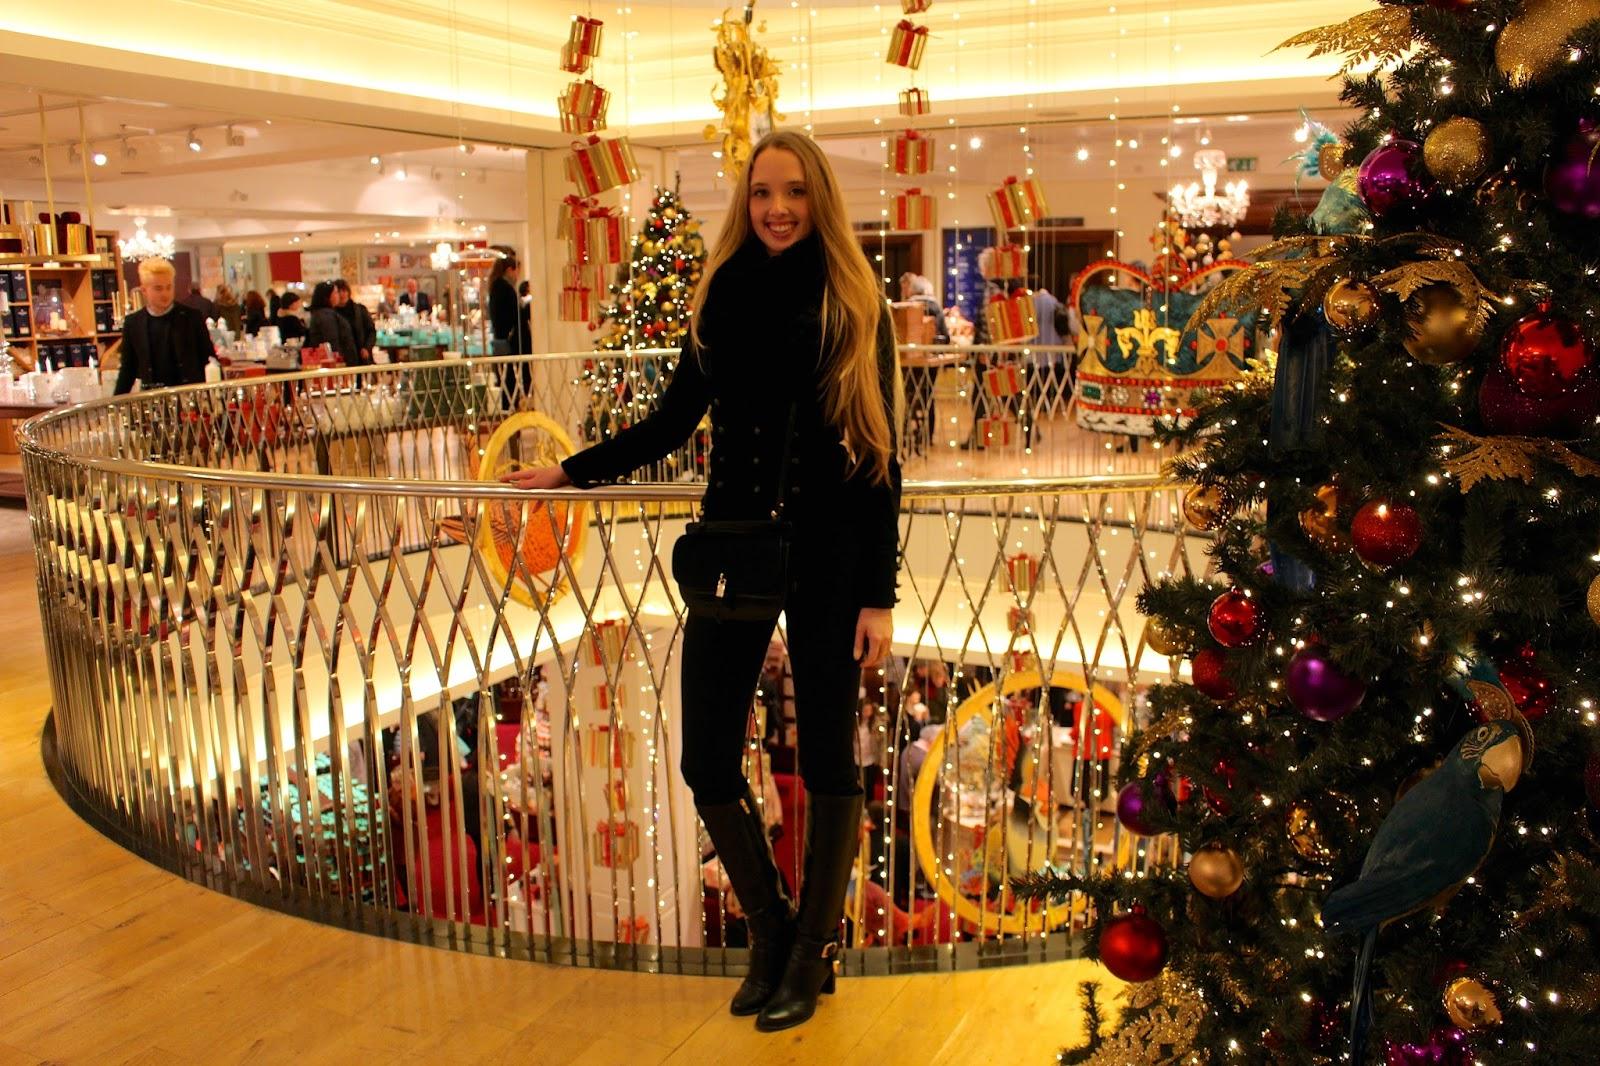 fortnum and mason christmas shopping 2015